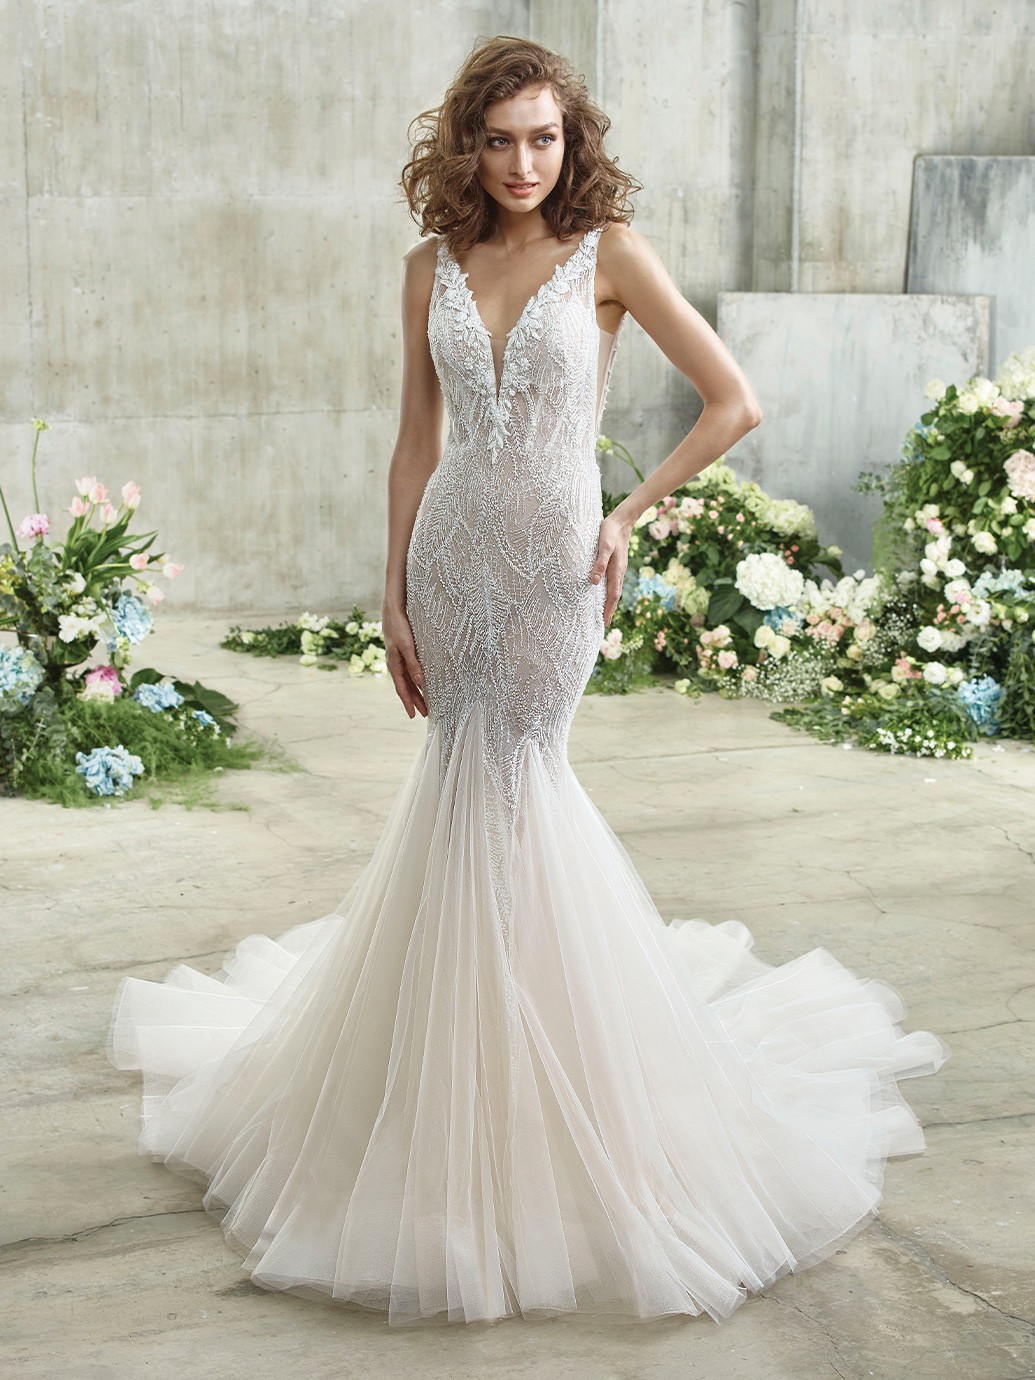 Emmy Wedding Dress from Badgley Mischka - hitched.co.uk